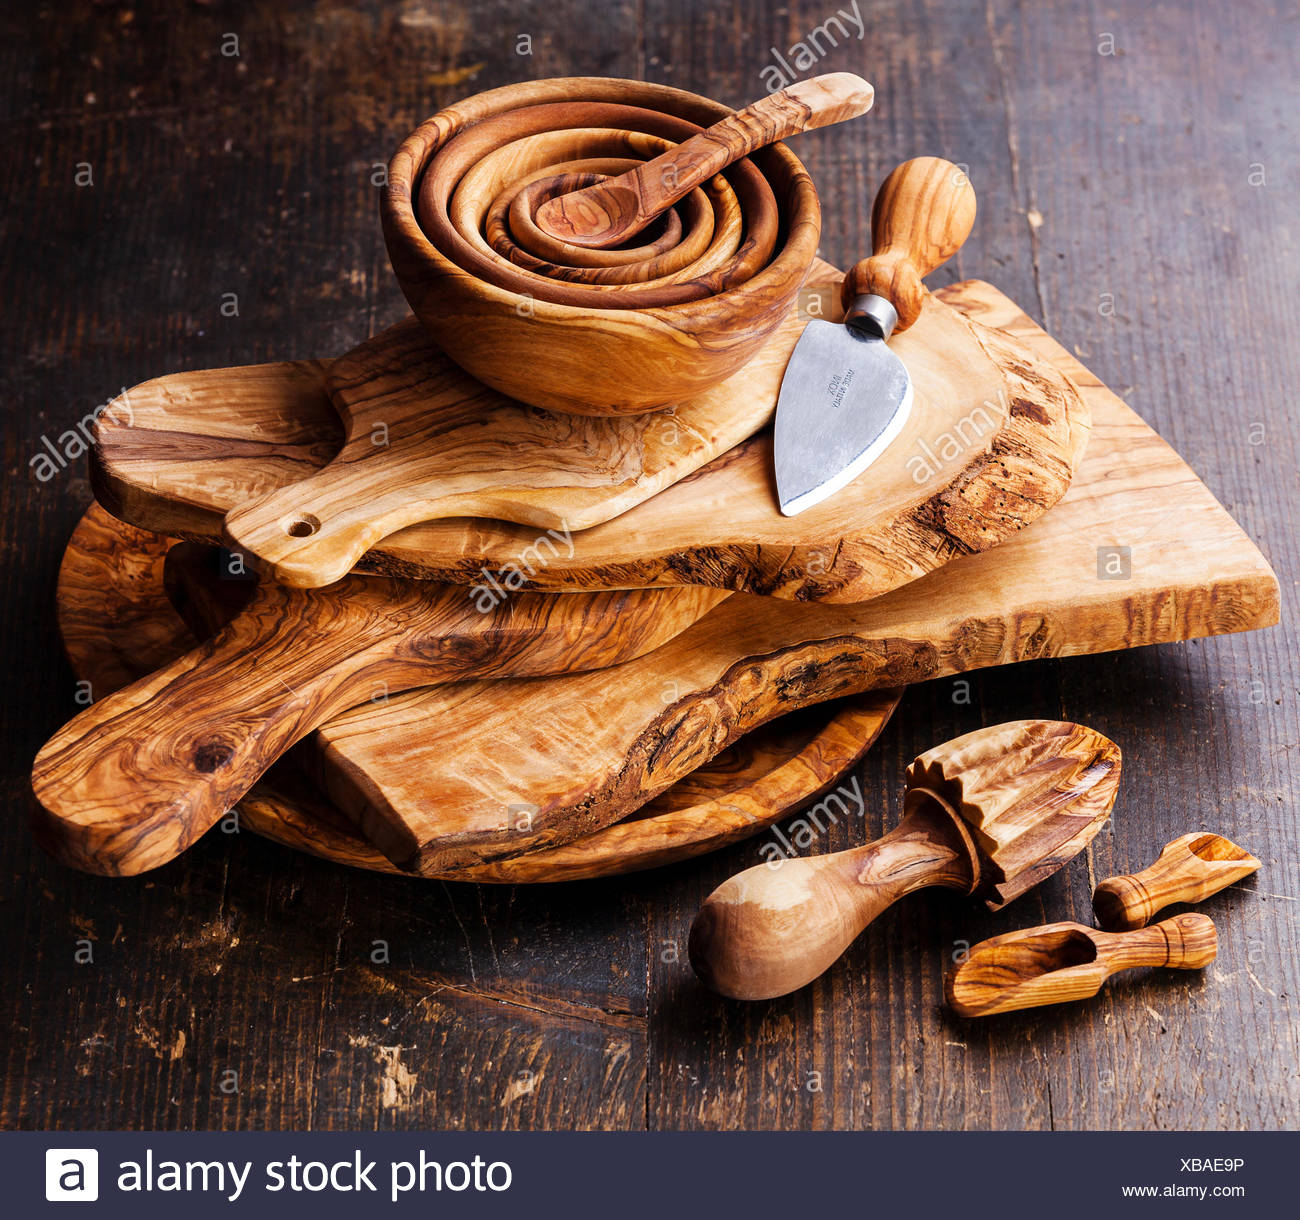 Olive wood tableware on dark wooden background - Stock Image